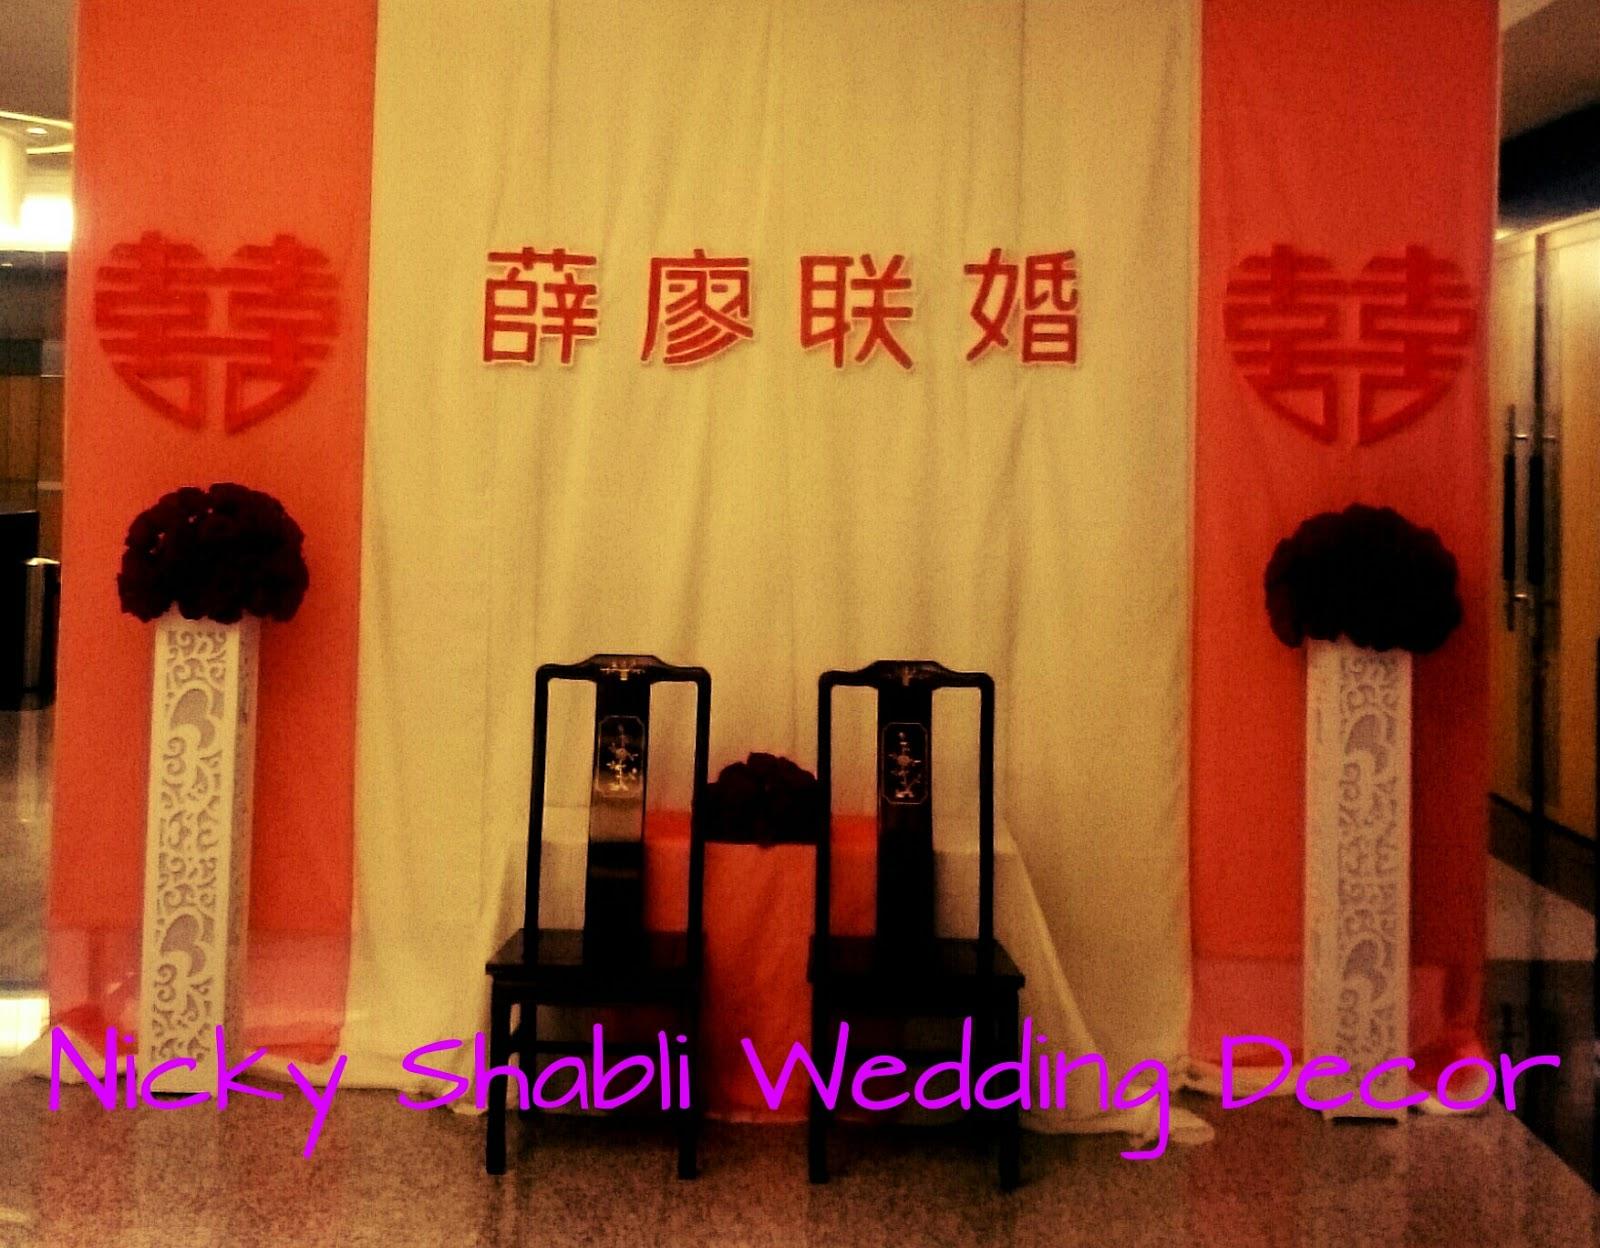 Nicky Shabli Wedding Decor Kuching Sarawak Chinese Wedding Photo